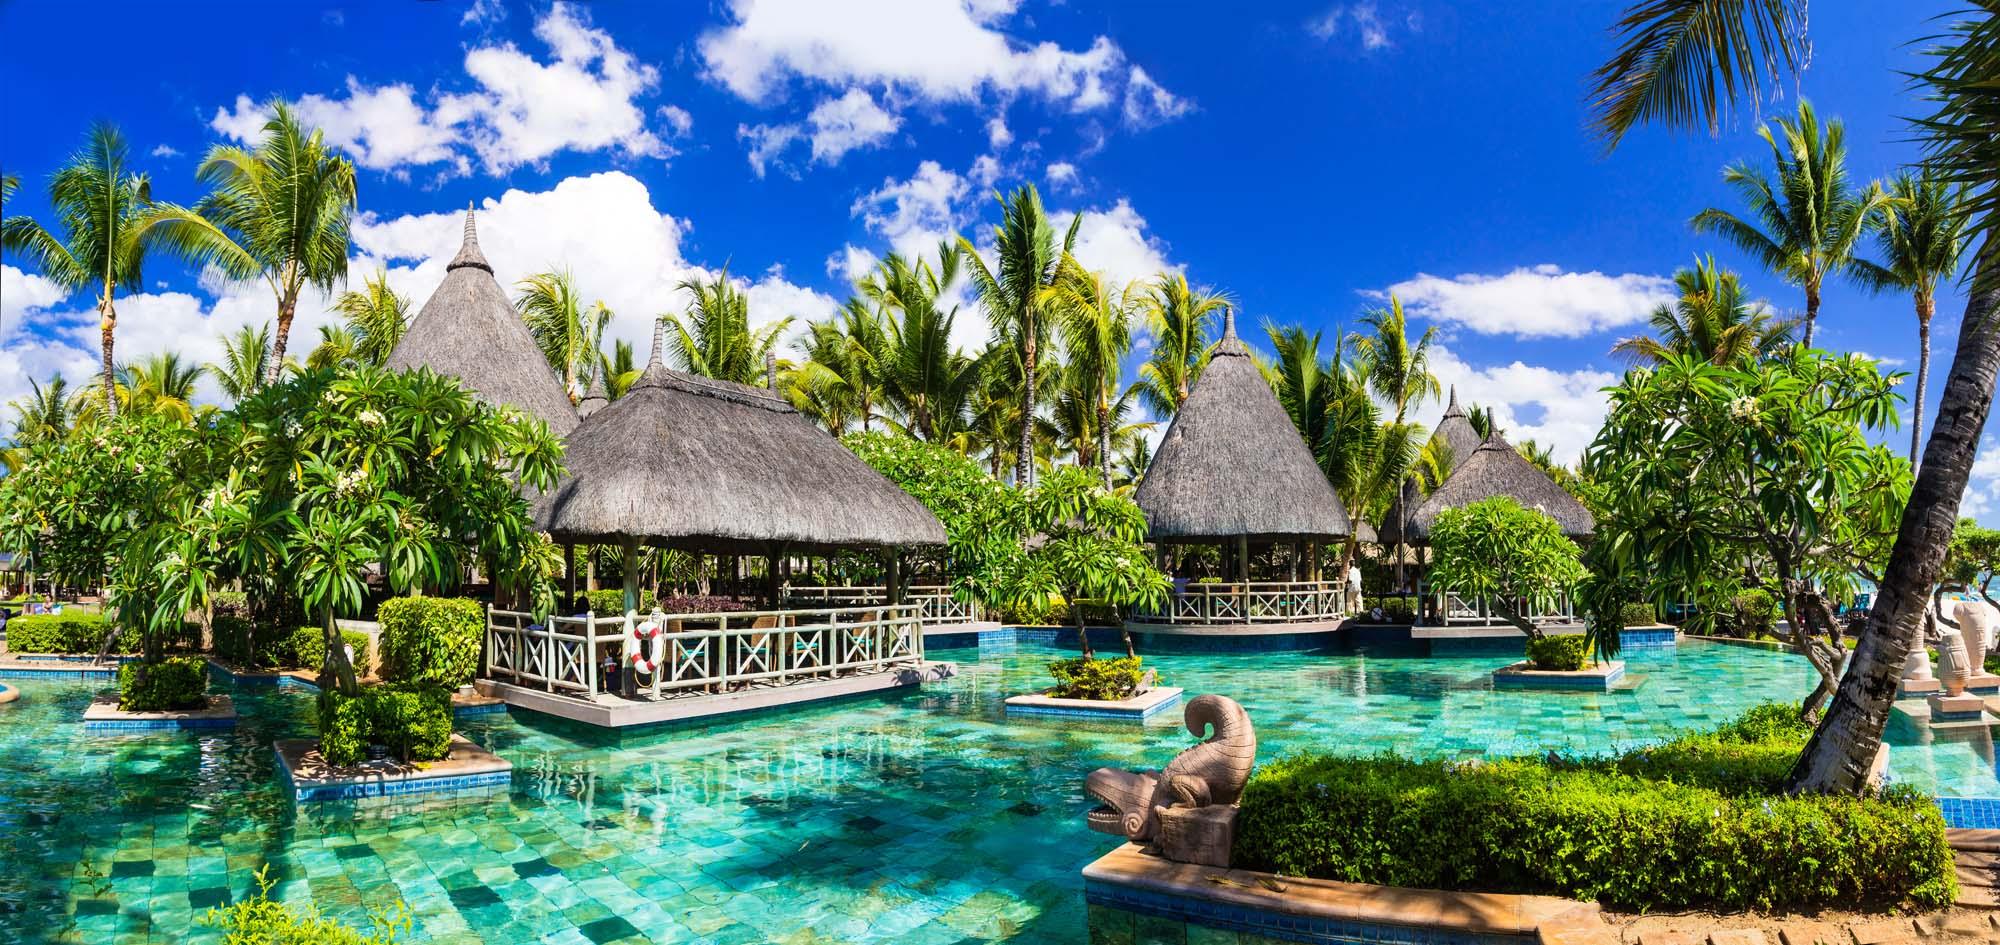 Mauritius eid summer travel destination ideas